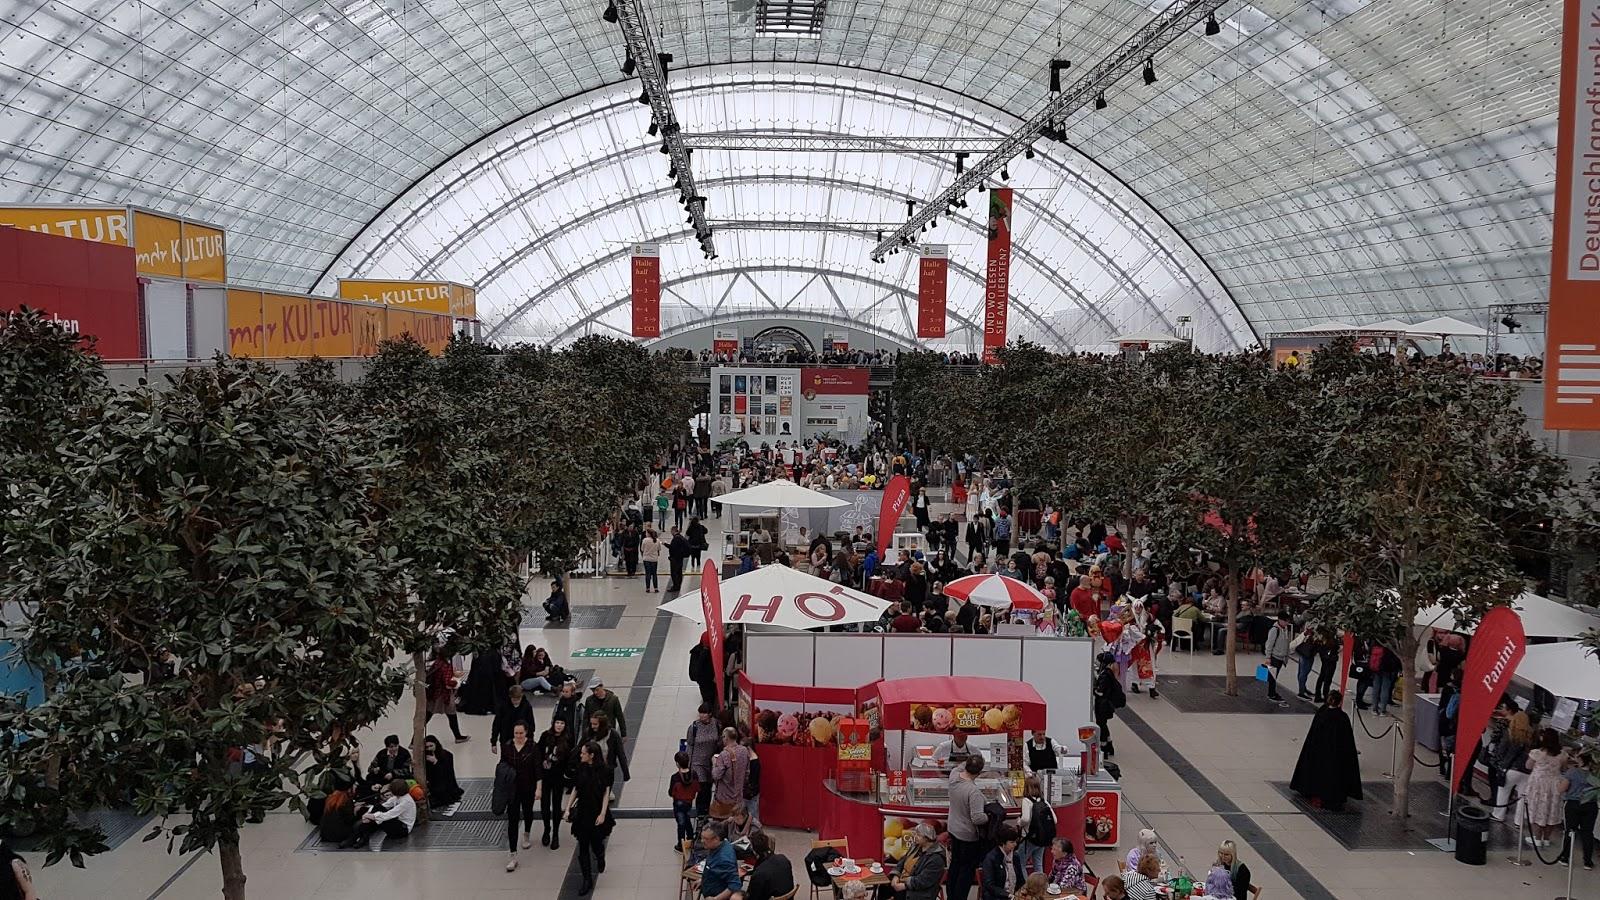 Seehases Lesewelt Leipziger Buchmesse 2018 Mein Resümee